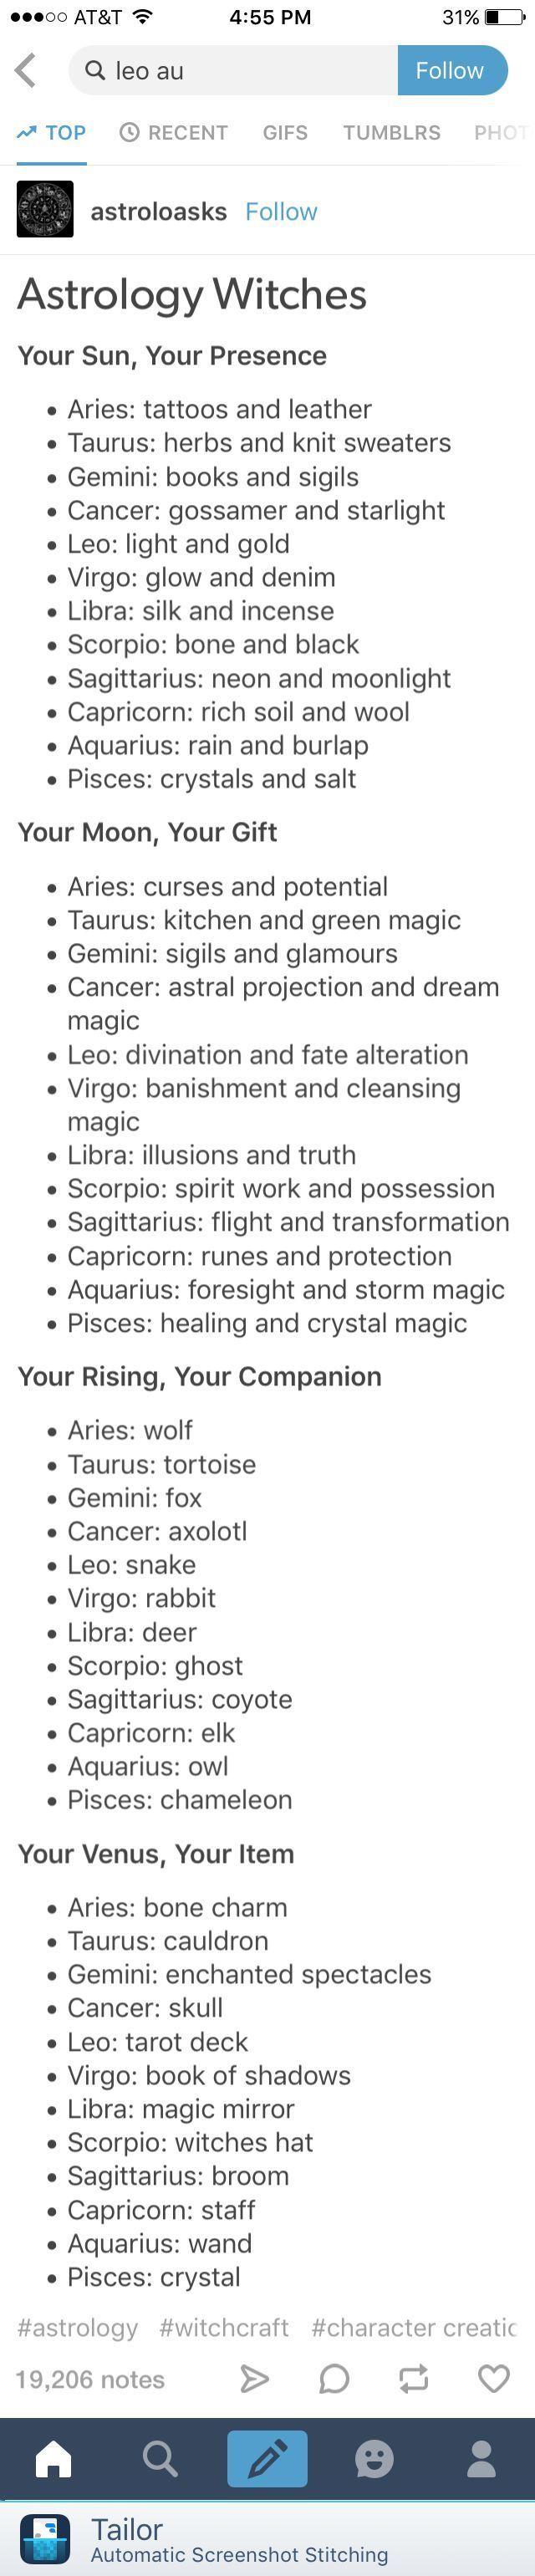 90 best Astrology General images on Pinterest